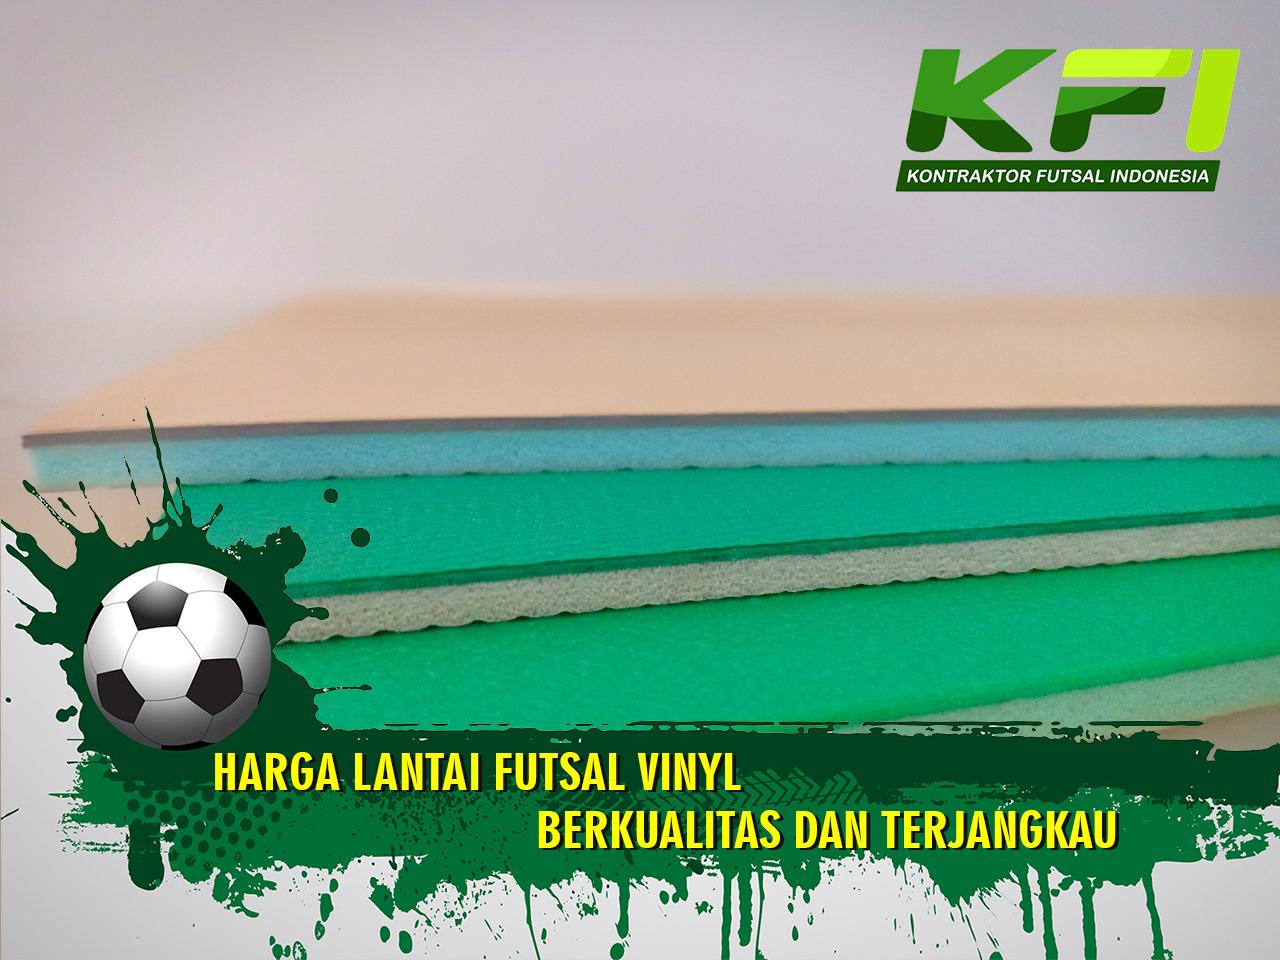 Harga Lantai Futsal Vinyl Berkualitas